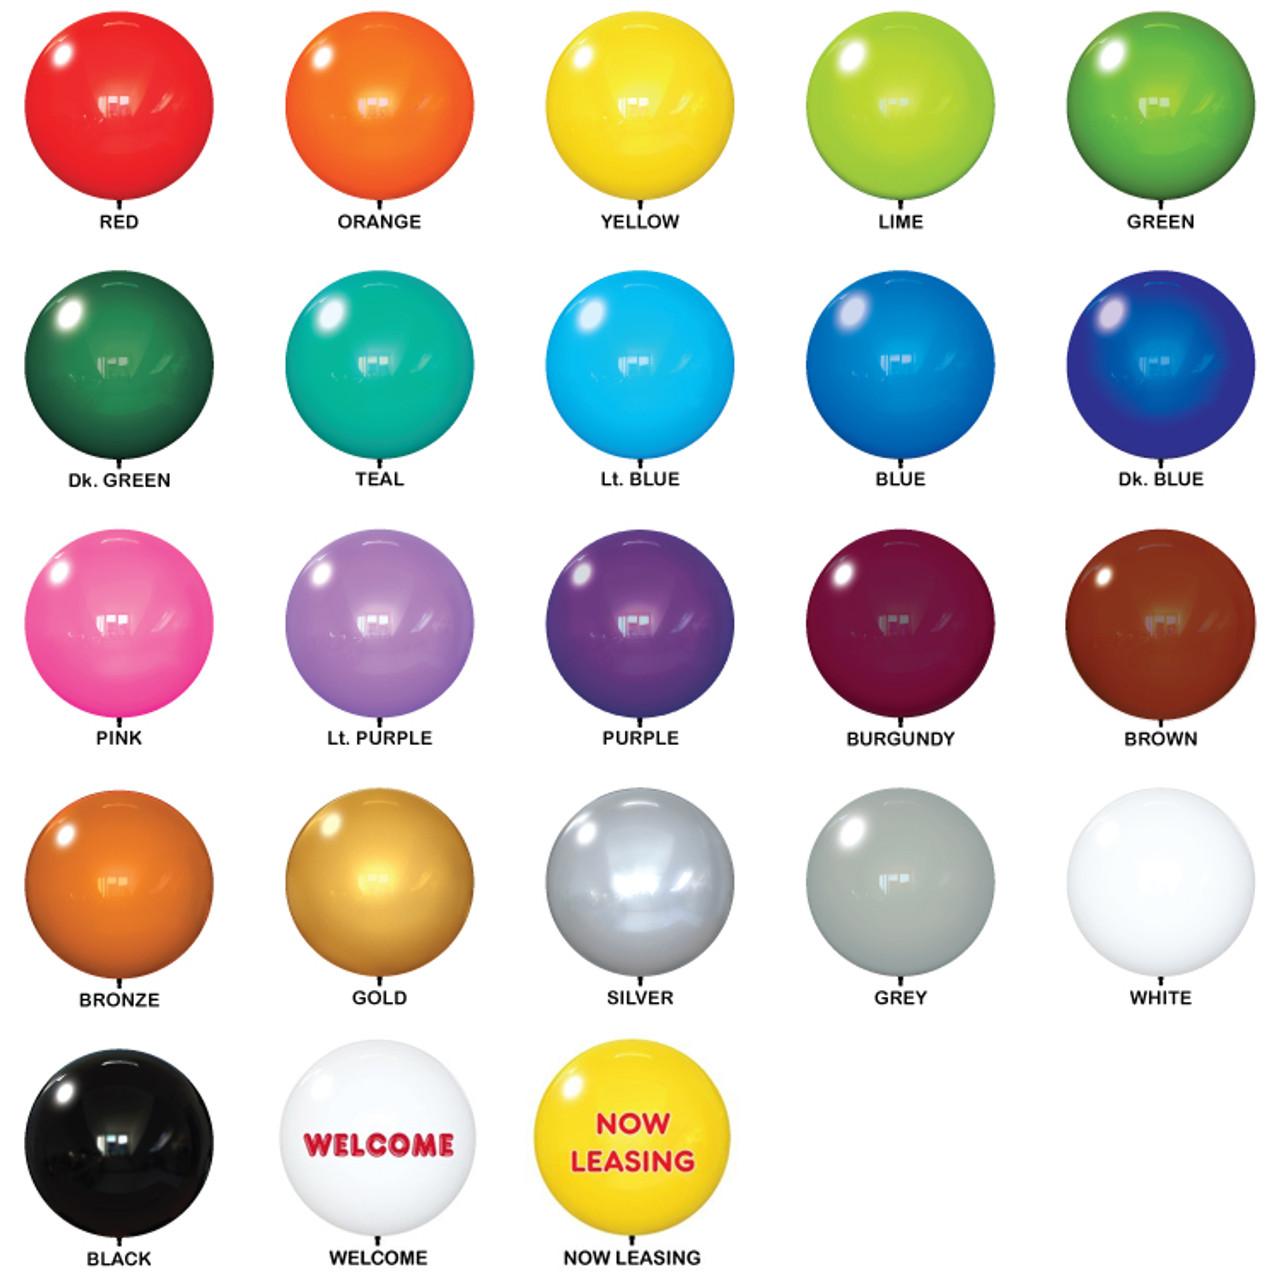 apartment balloons